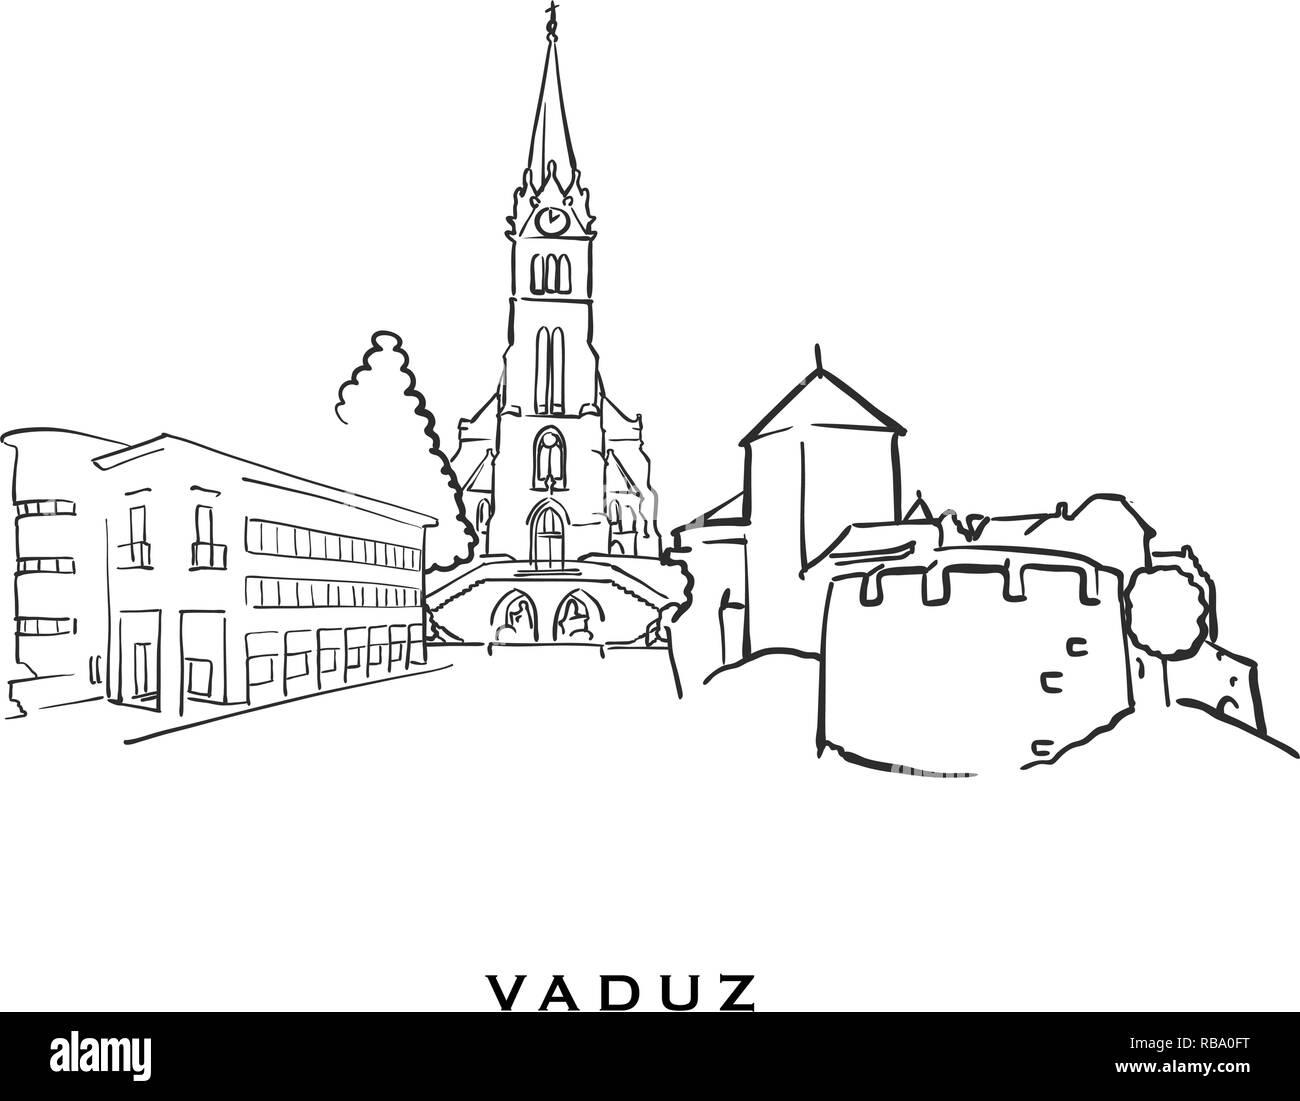 Vaduz Liechtenstein famous architecture  Outlined vector